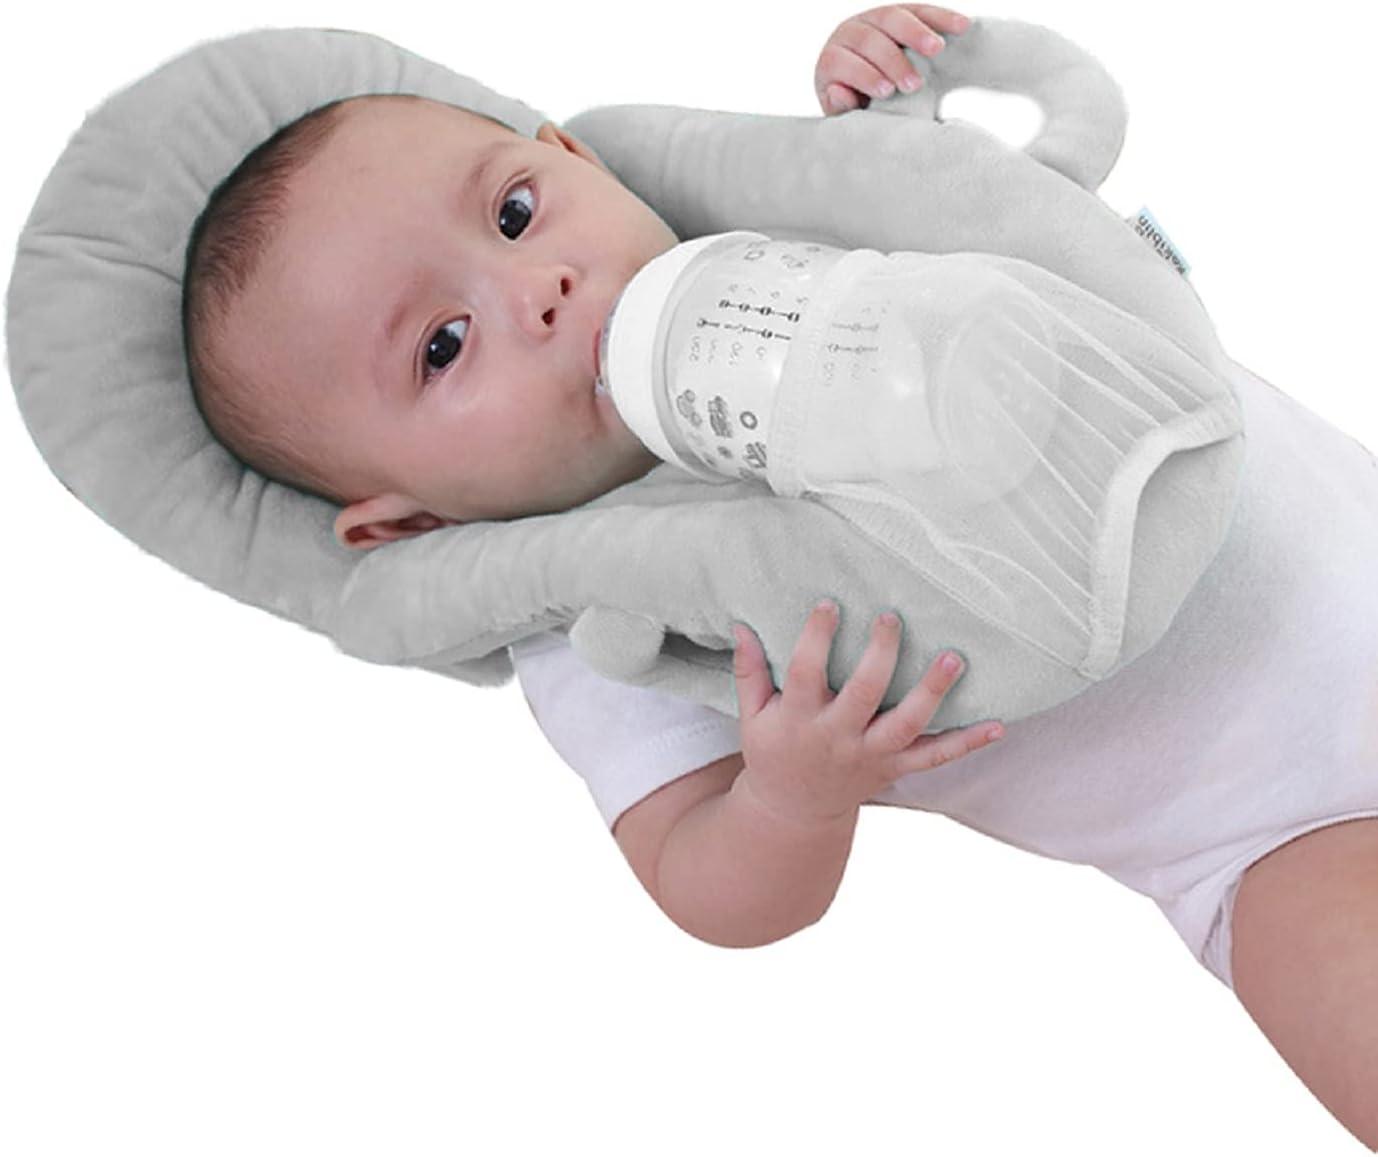 Baby Breast Feeding Pillow Support Portable Detachable Self-Feeding Pillow Bottle Holder Infant Cushion